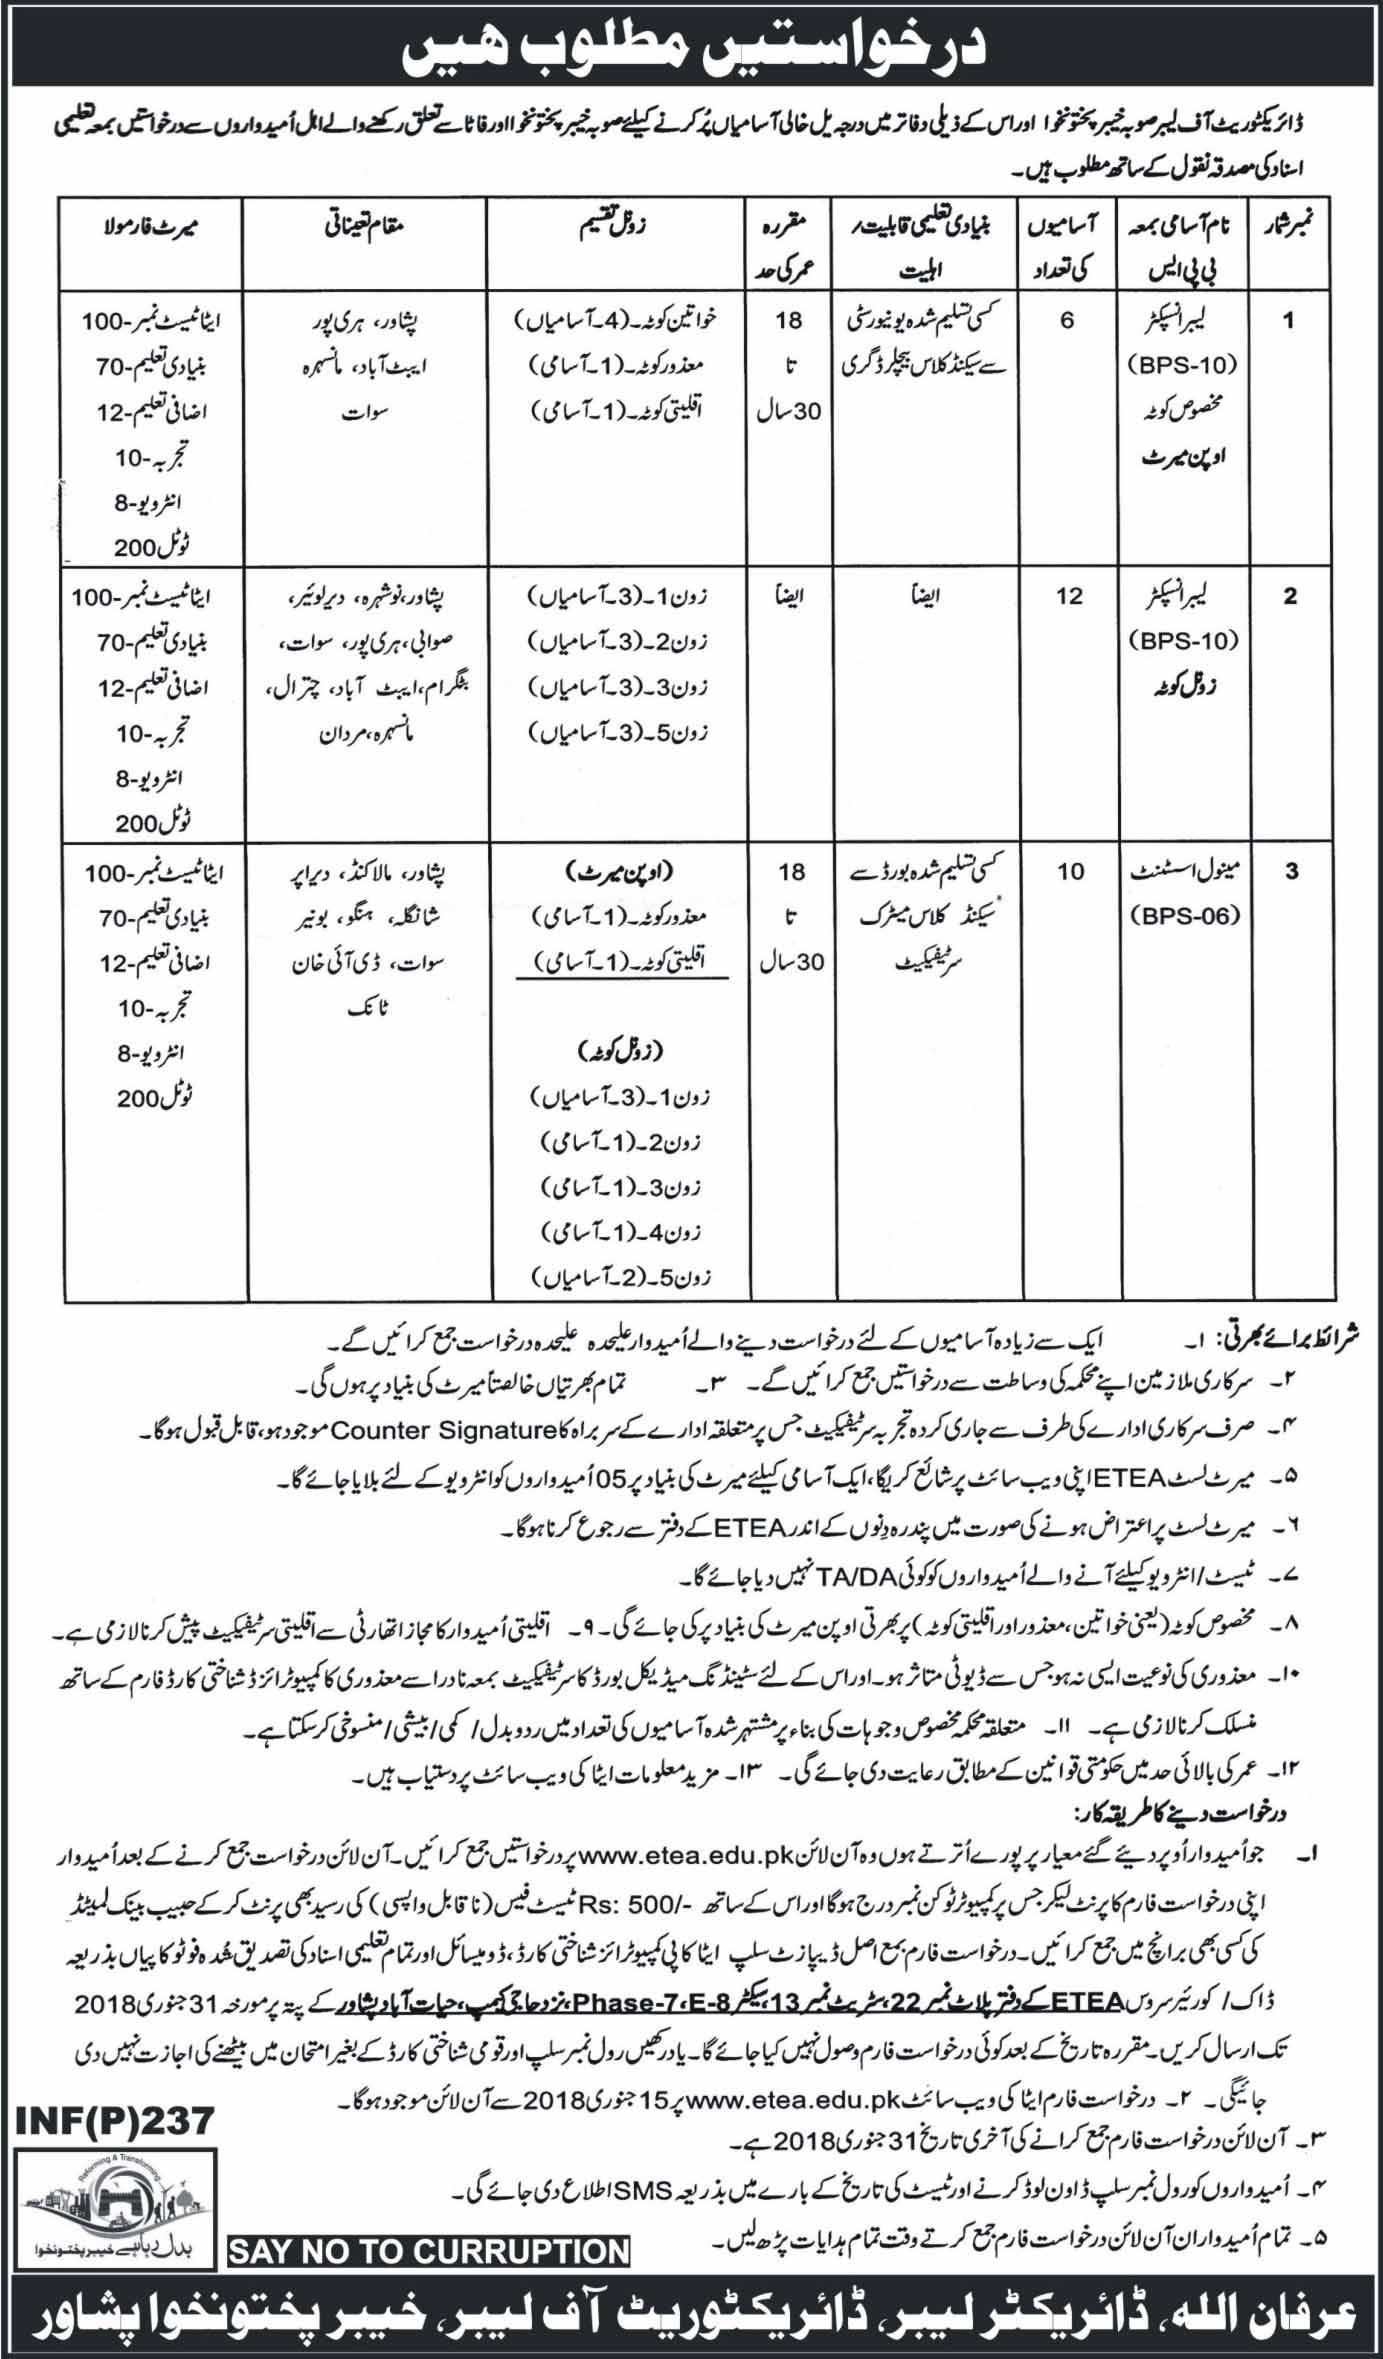 Khyber Pakhtunkhwa, Directorate of labor 28 Jobs, 16 January 2018 Daily Mashriq Newspaper.